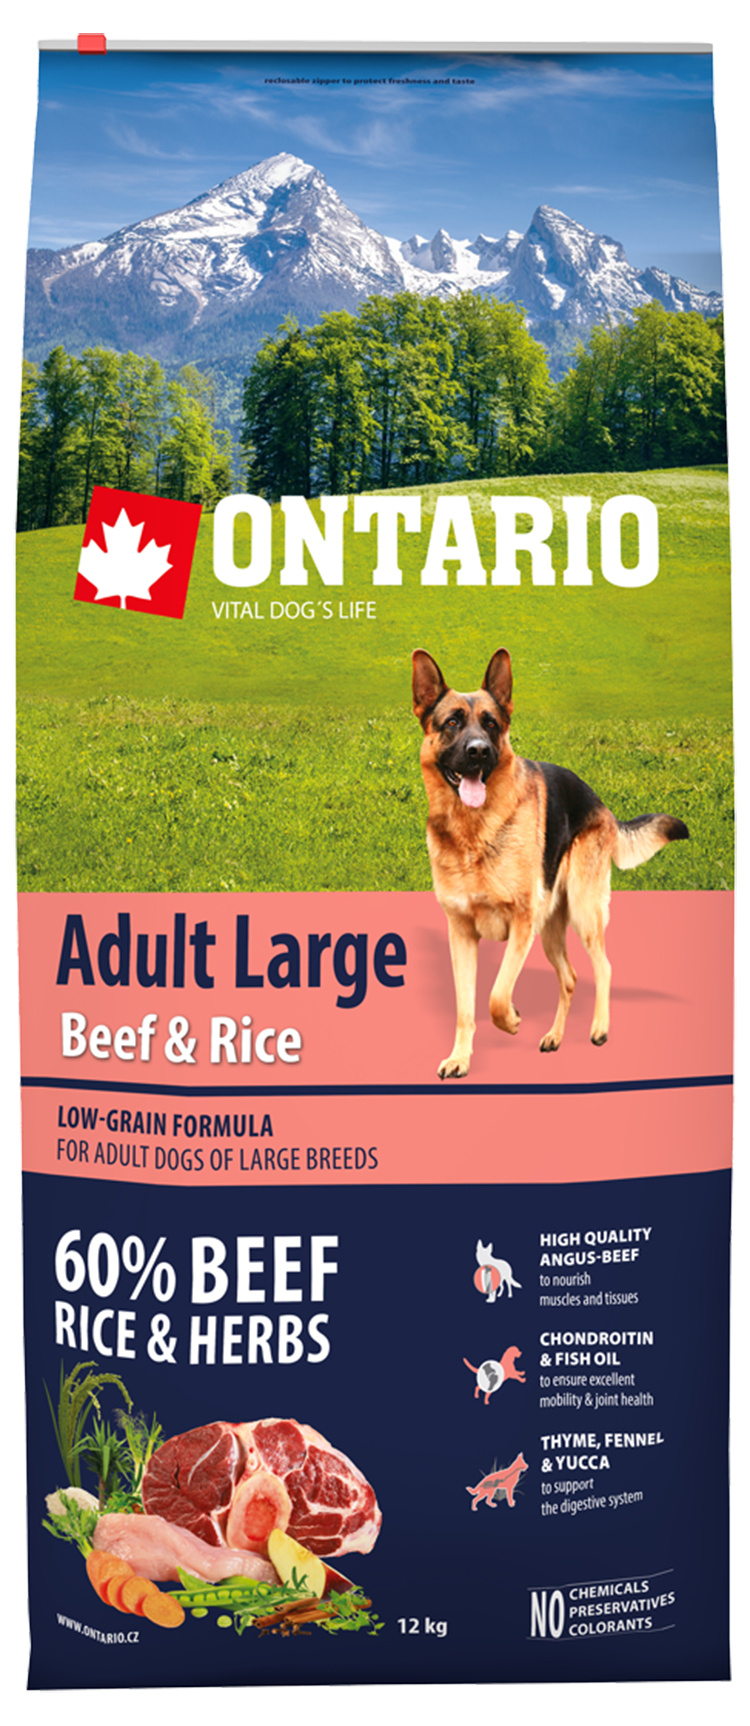 Barība suņiem - ONTARIO Adult Large Beef & Rice 12kg